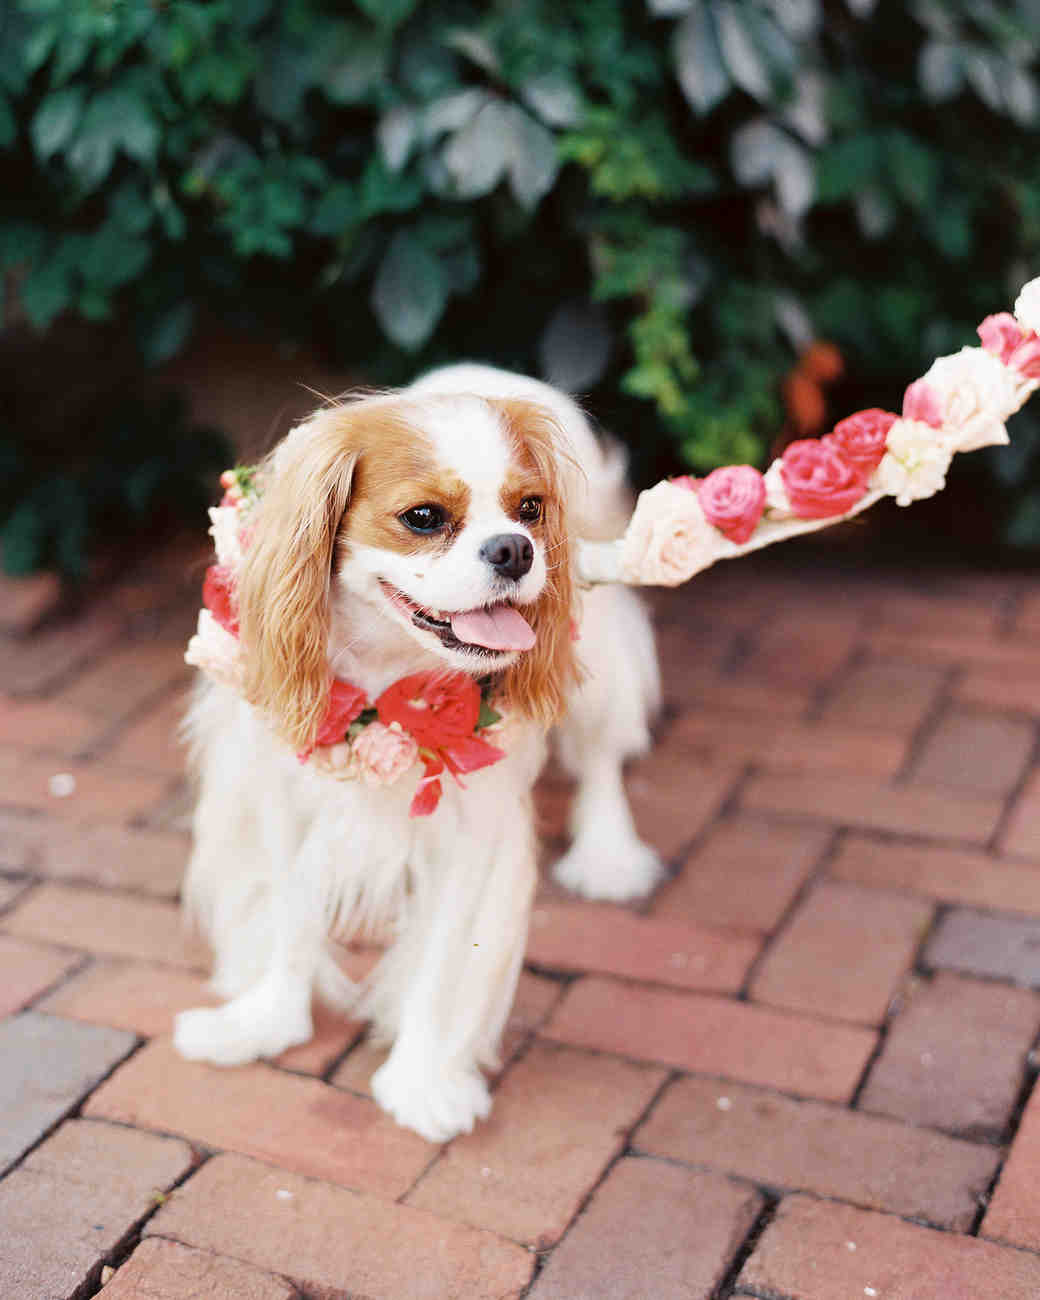 Floral κολάρο και λουρί για την ημέρα του γάμου.